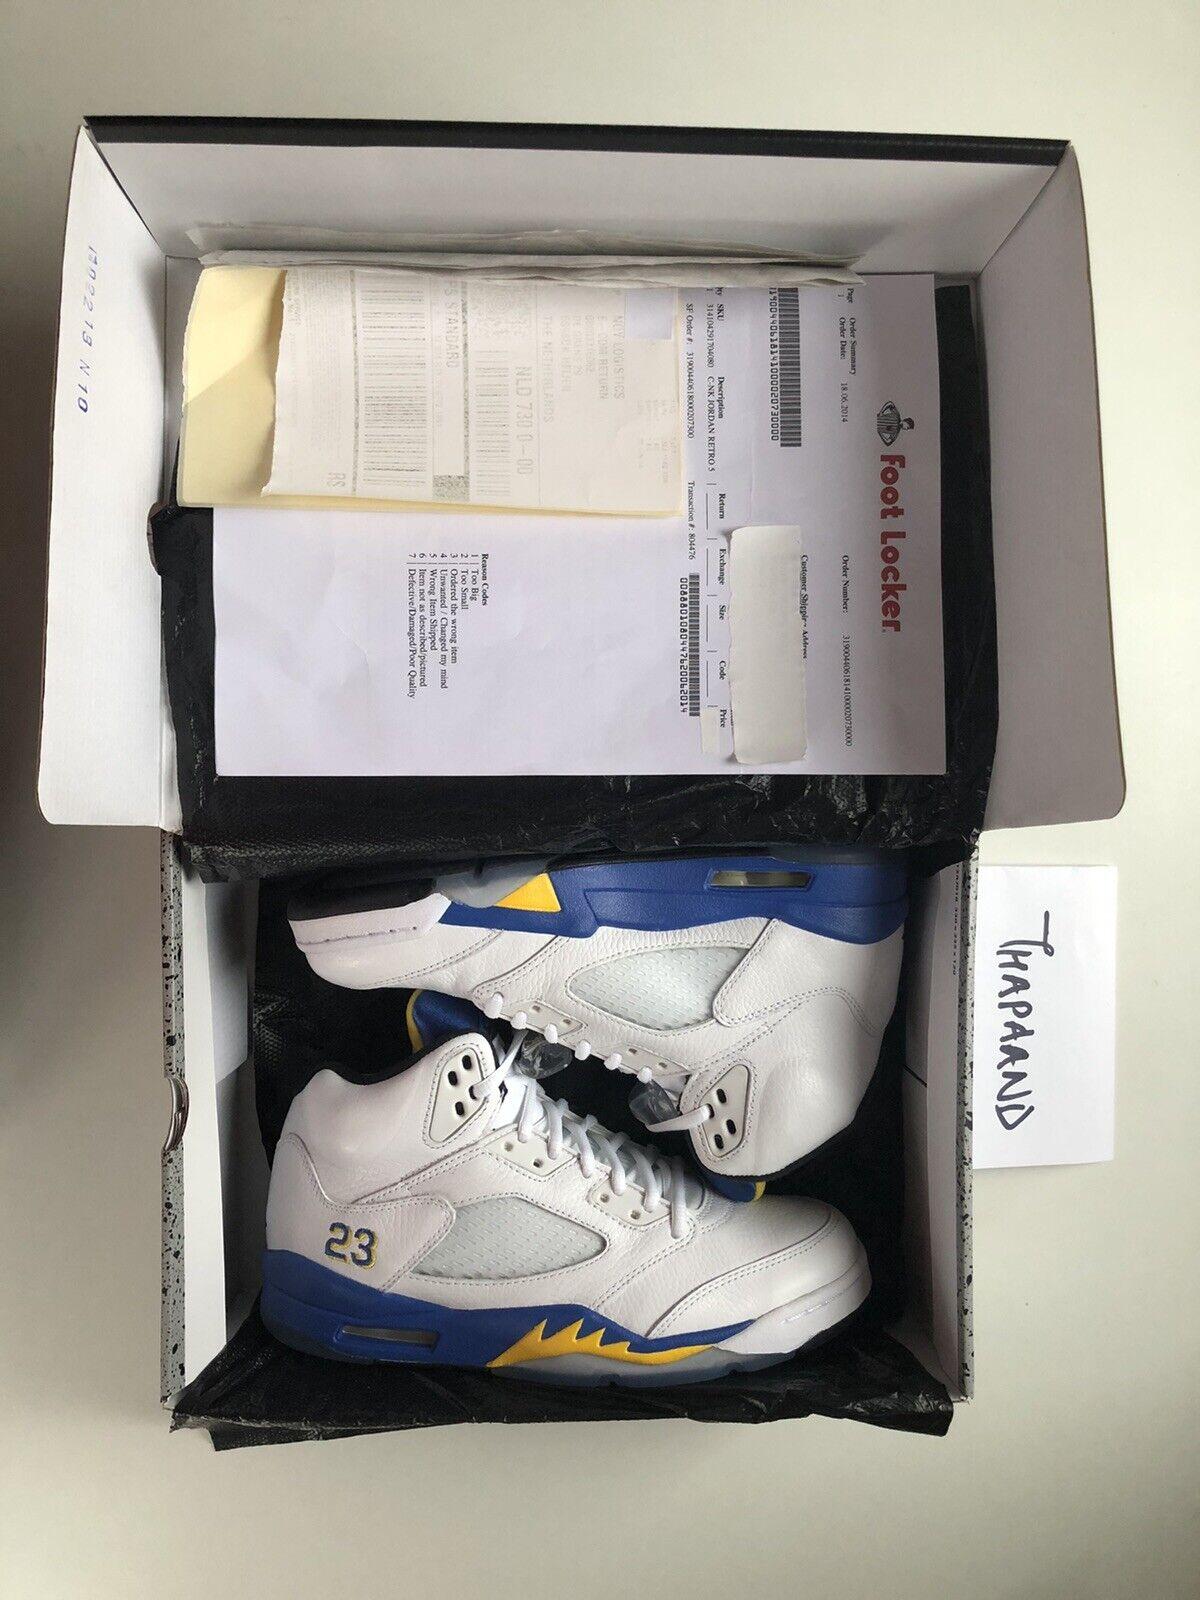 Nike Air Jordan 5 V White Laney Yellow Blue size 7 Retro